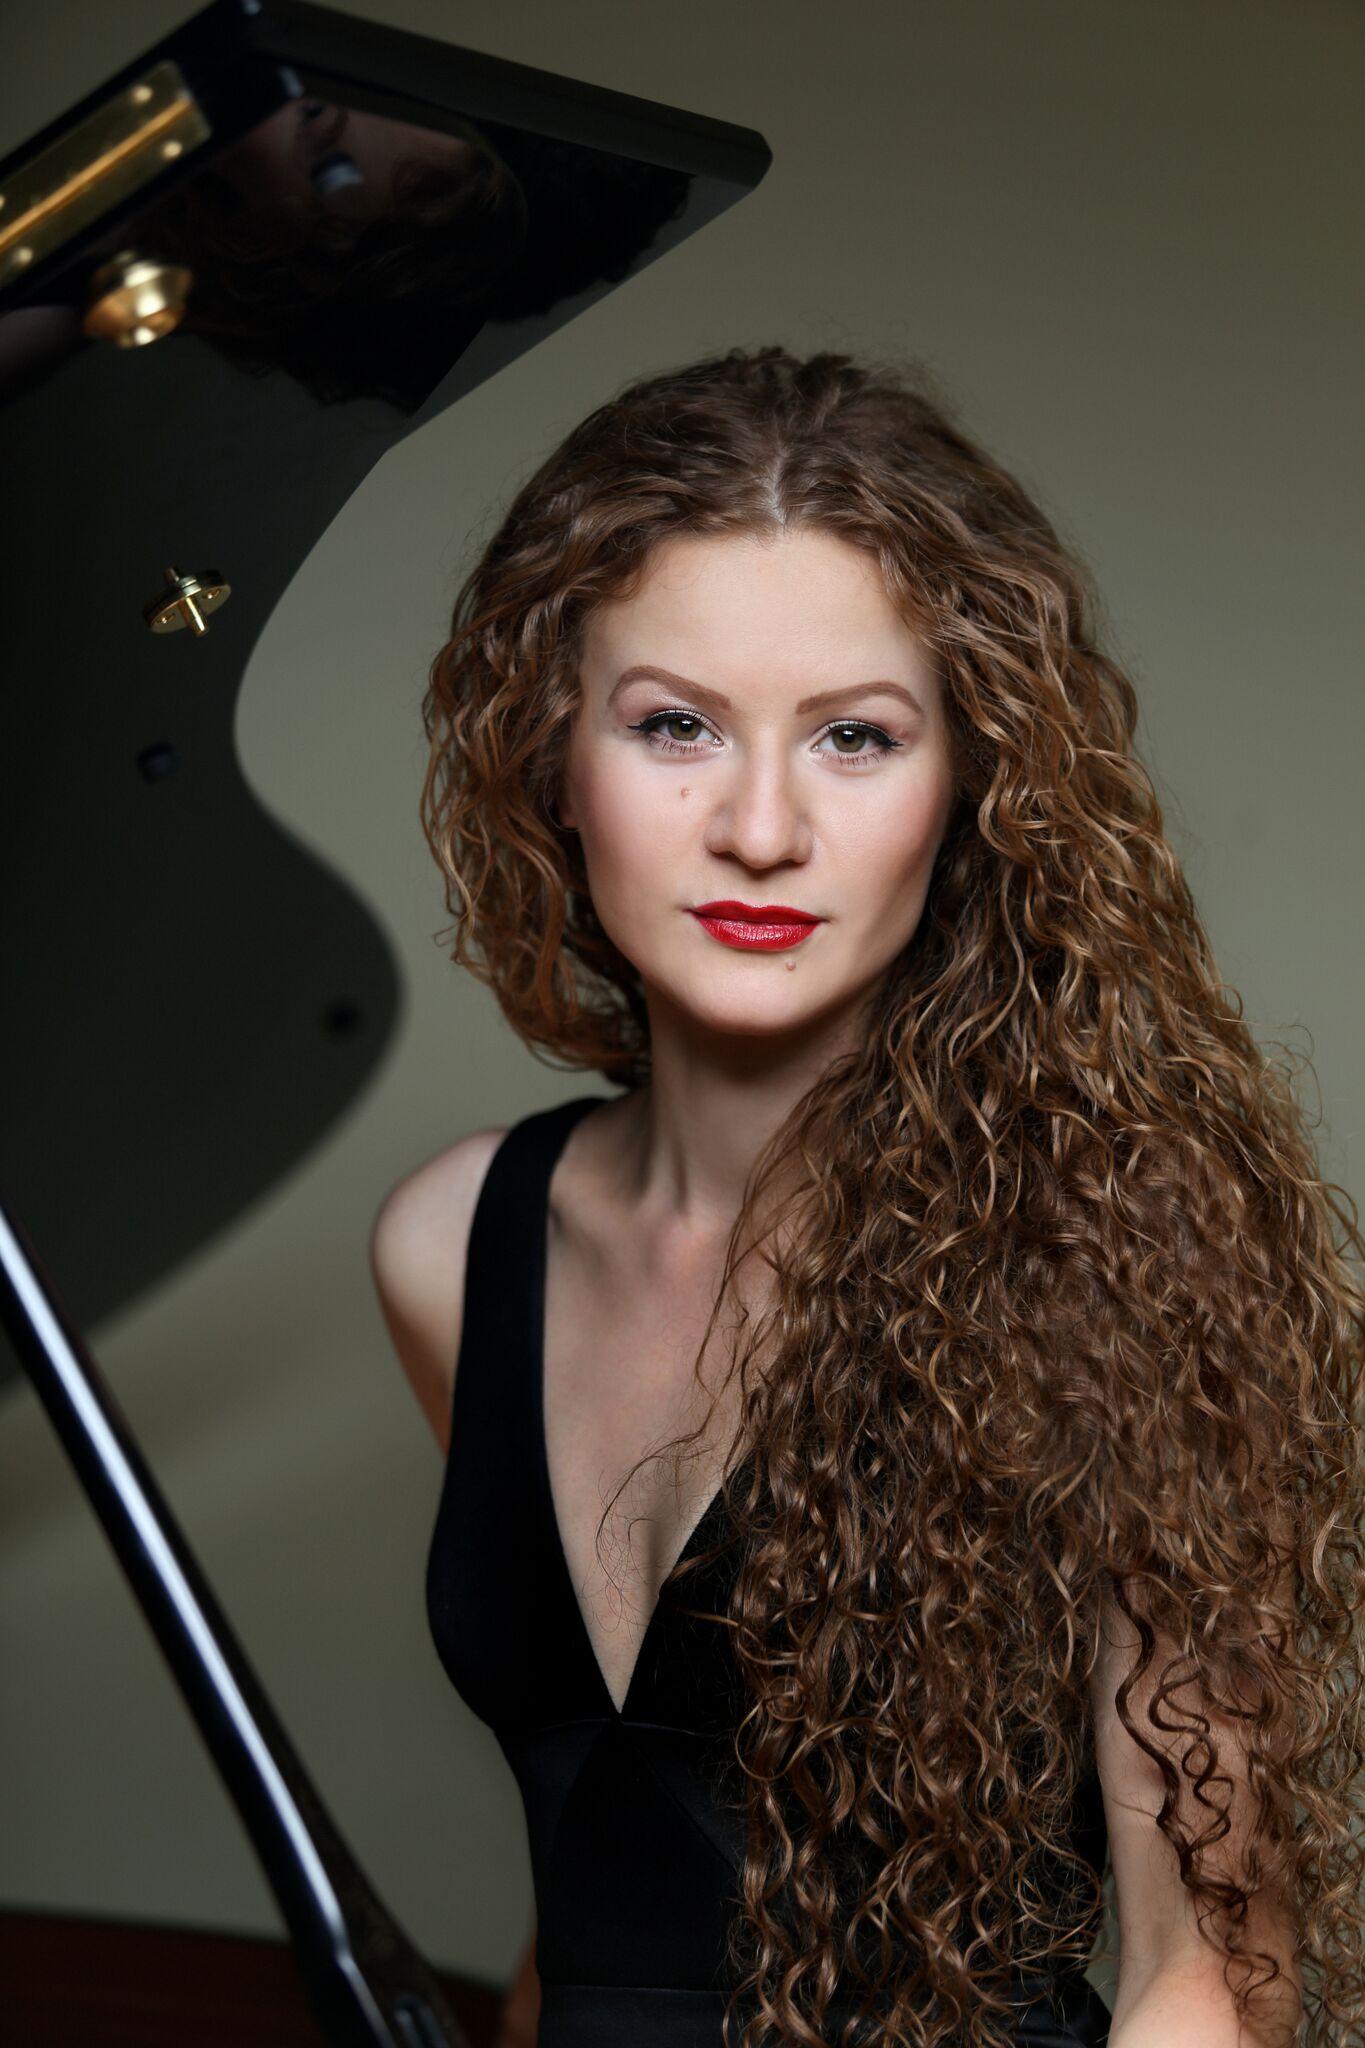 RACHMANINOFF Cello Sonata in G Minor, Op. 19 (arr. Korepanova) - Asiya Korepanova, piano